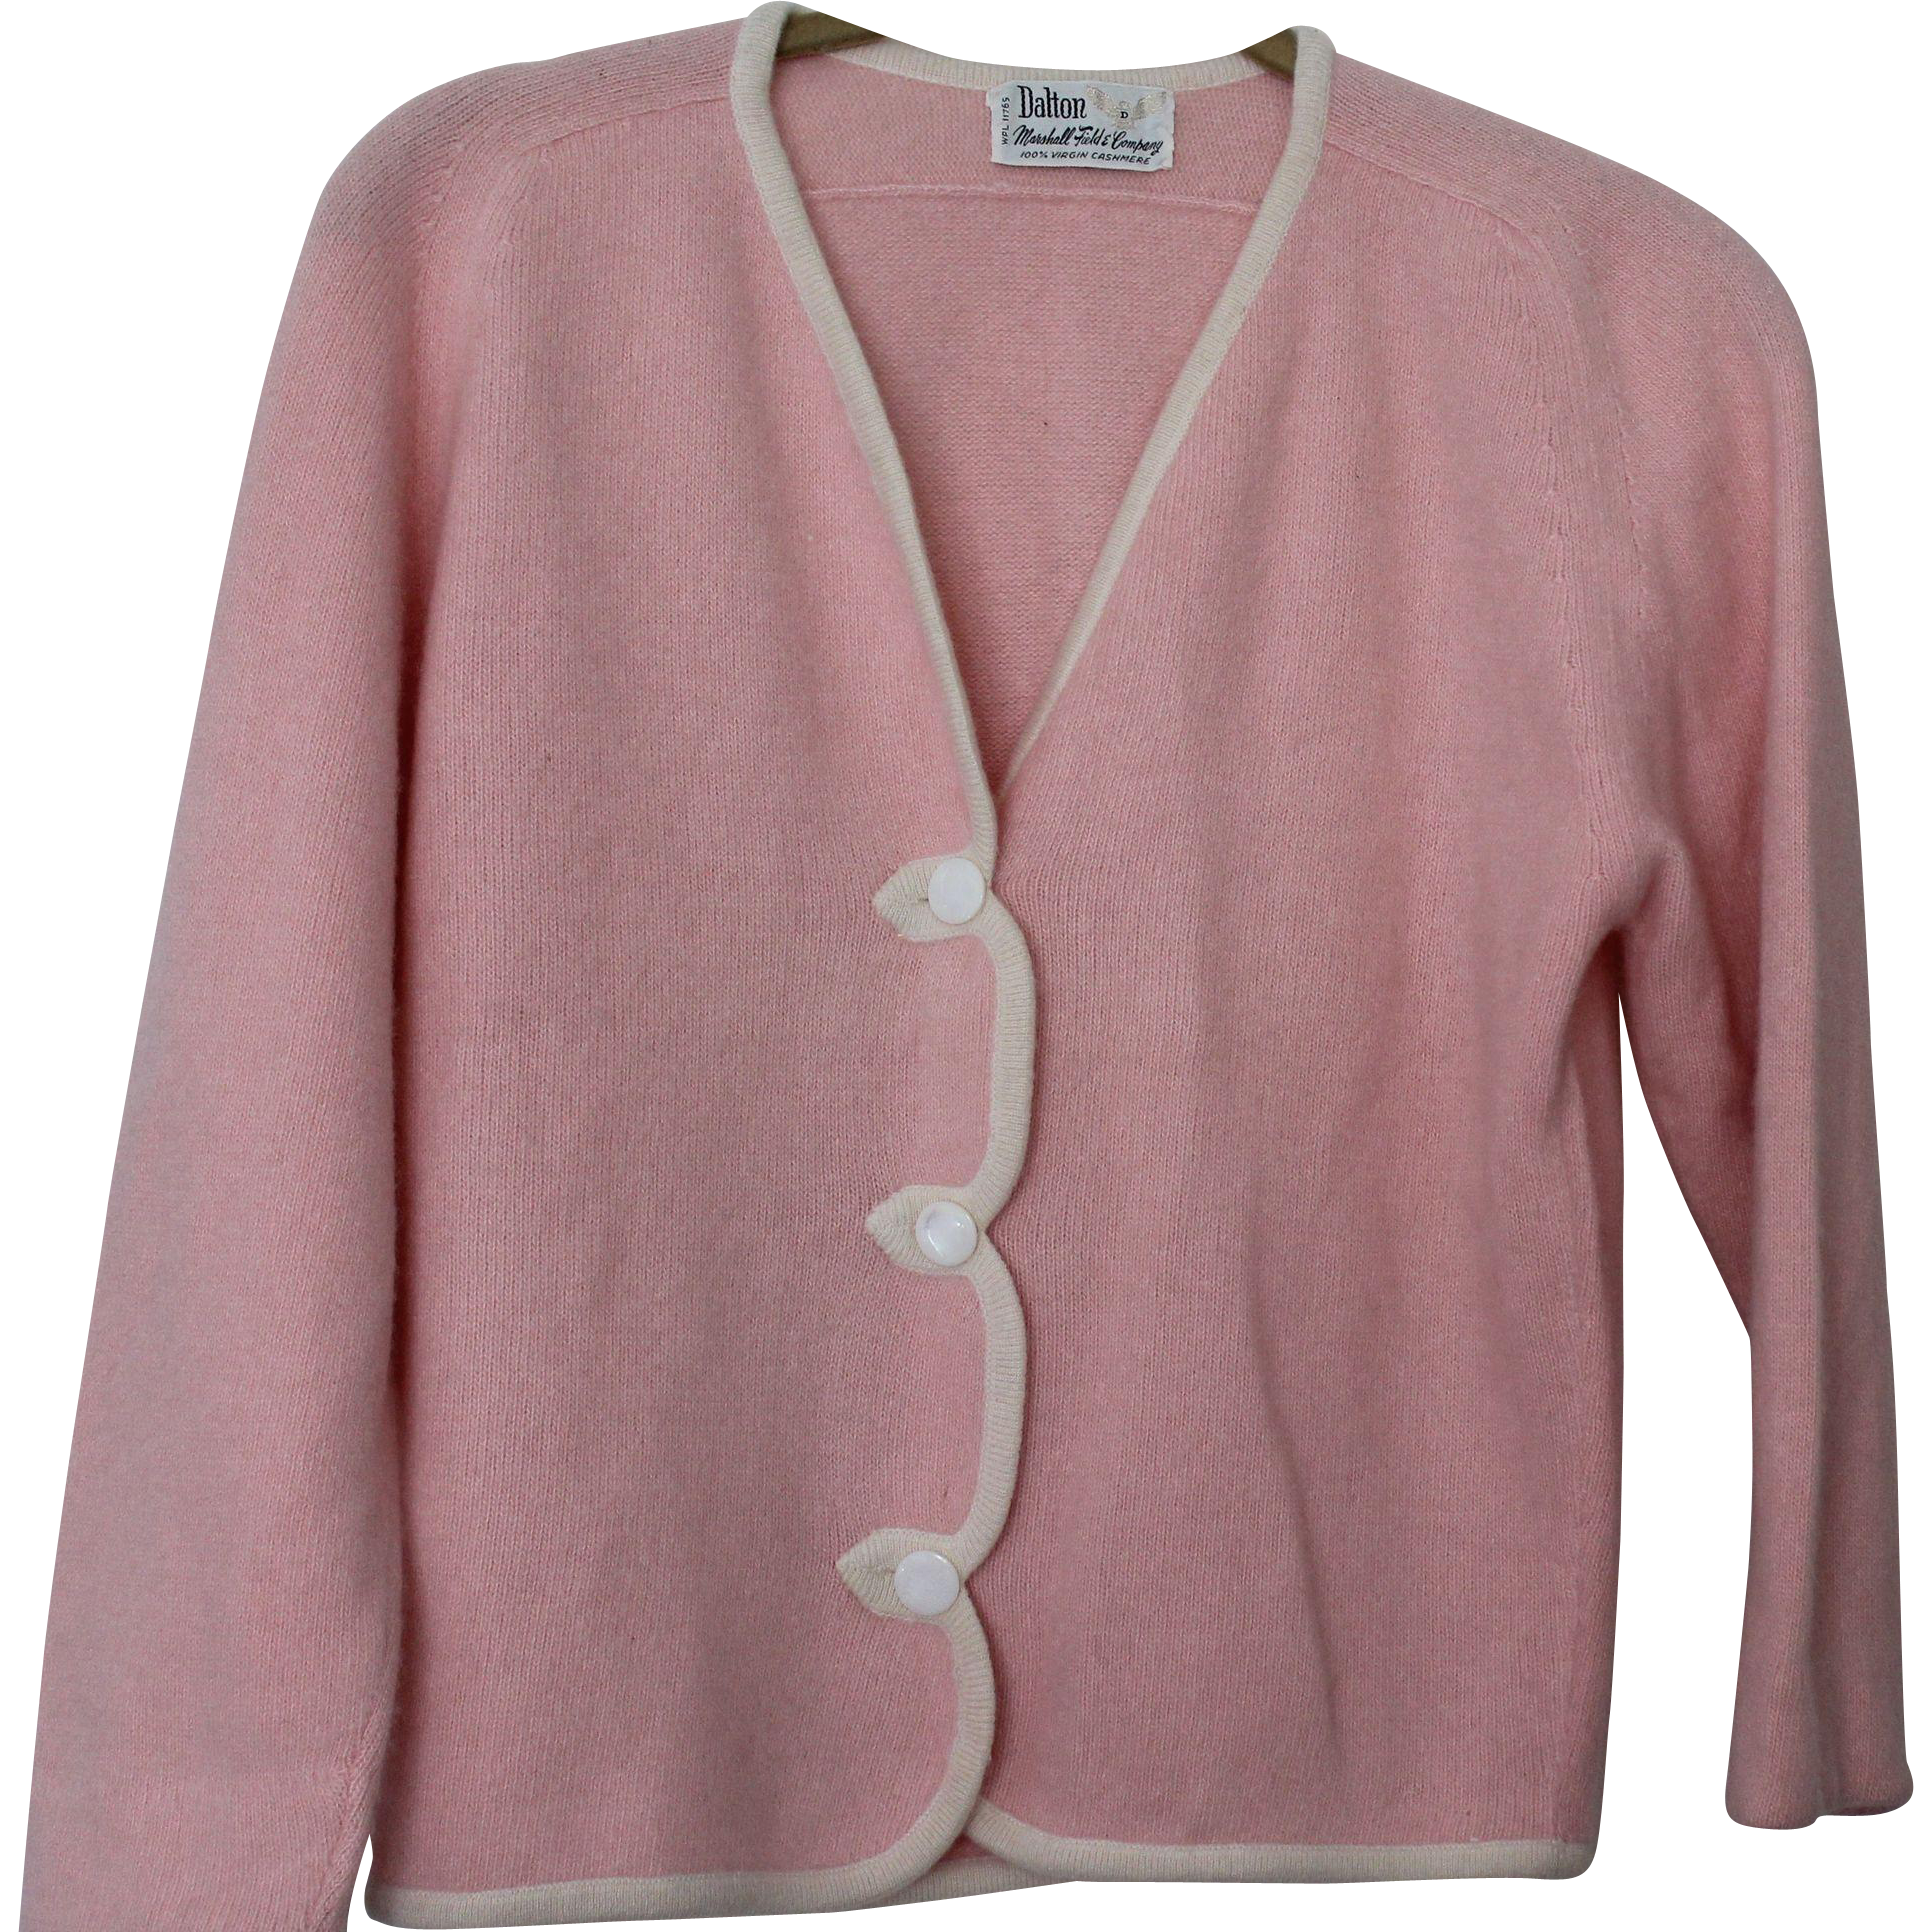 Vintage Pink 3 Button Cashmere Cardigan Sweater by Dalton